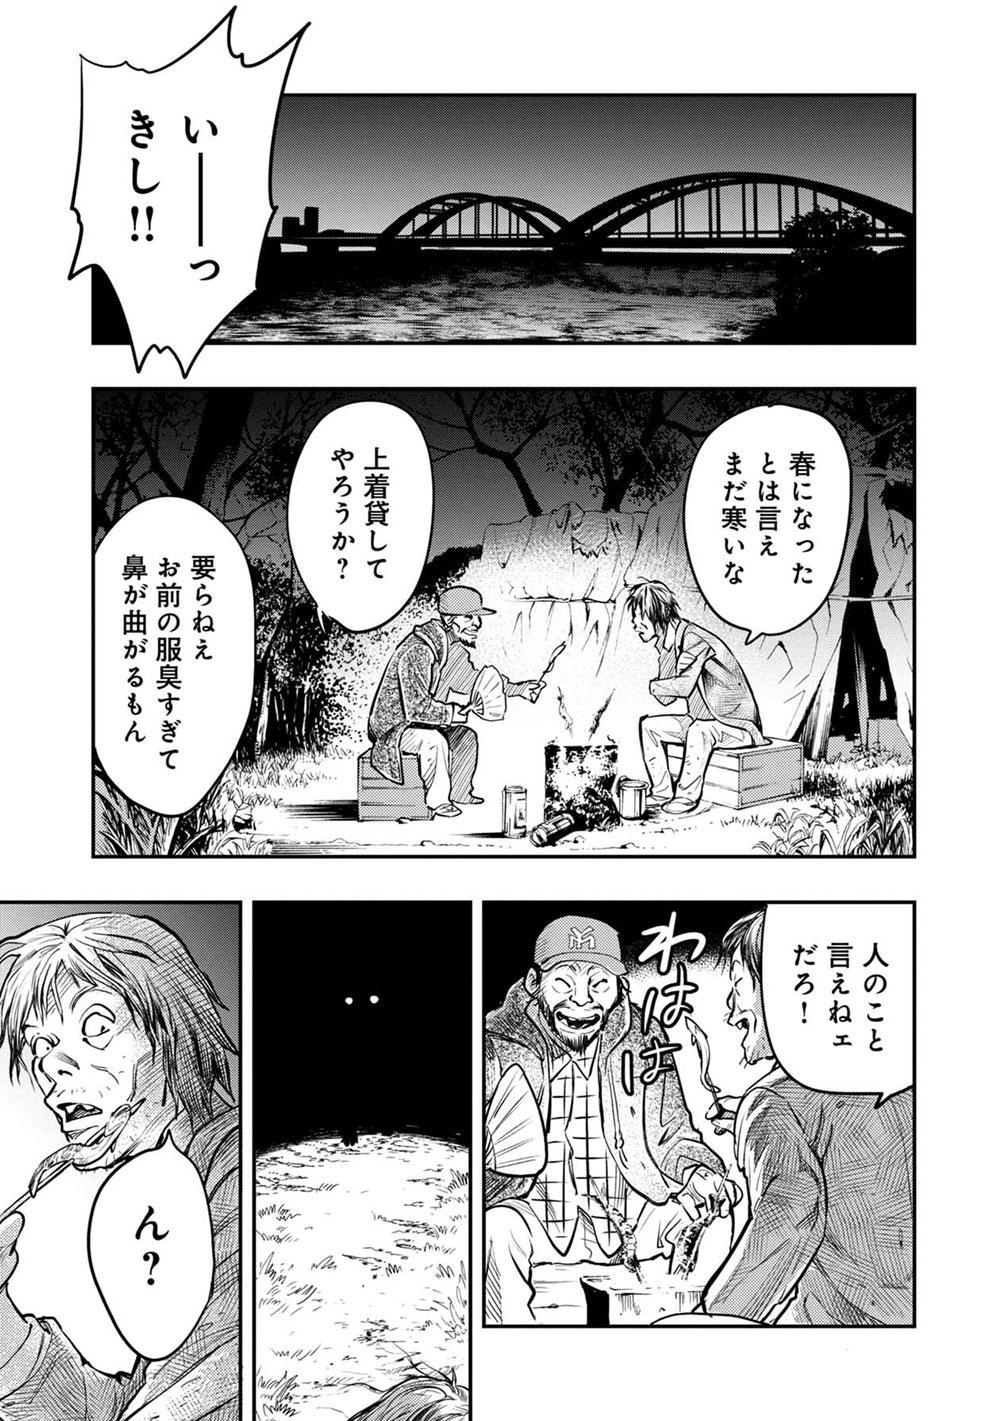 inugami_re_001_001.jpg